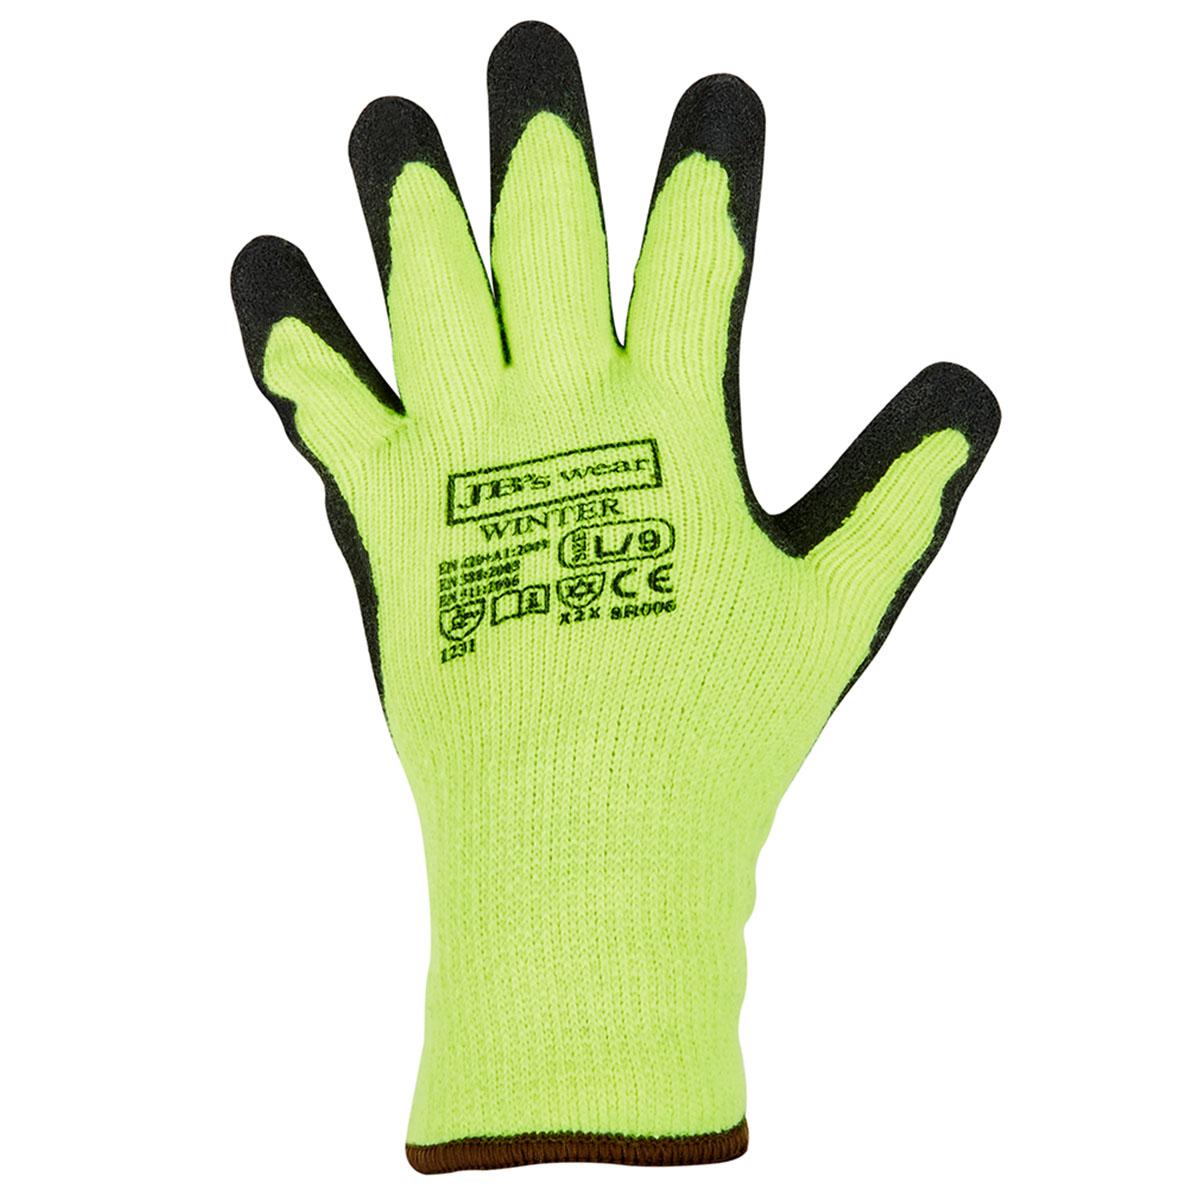 Winter Glove Lime/Black-Lime  /  Black